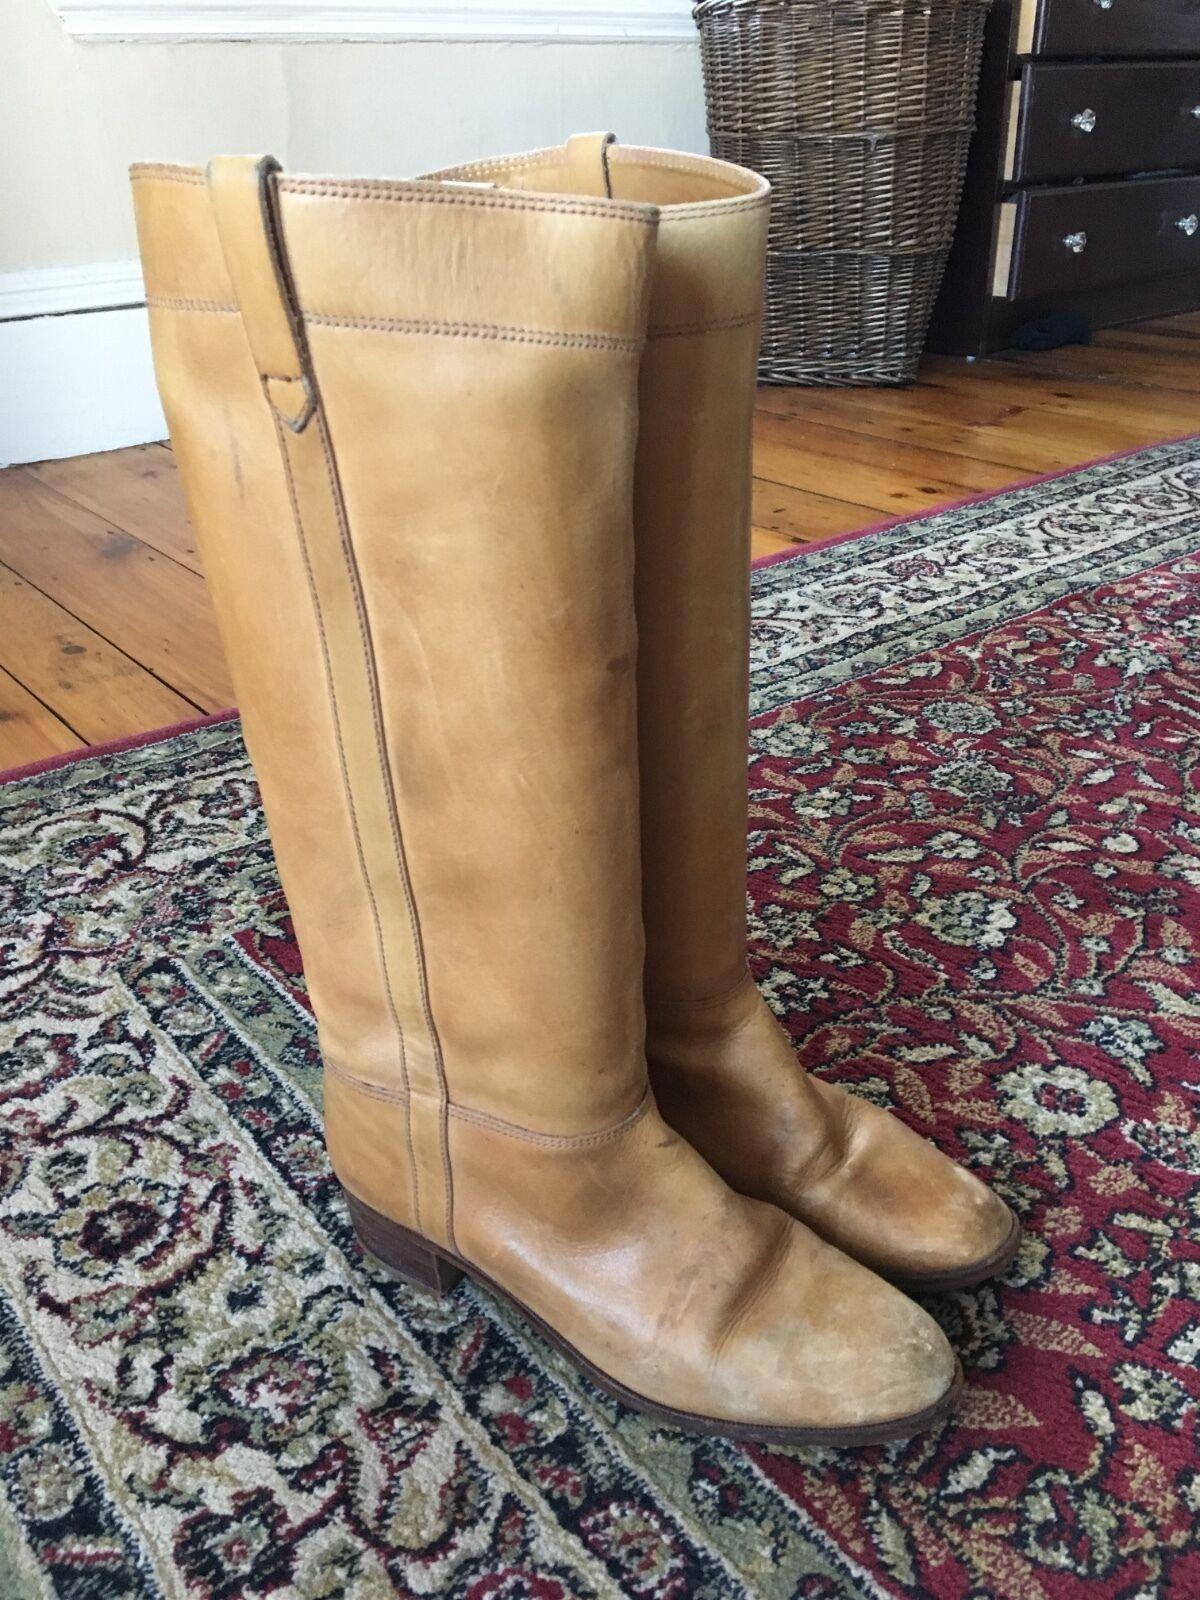 NINE WEST - Vintage Riding Boot - Size 9